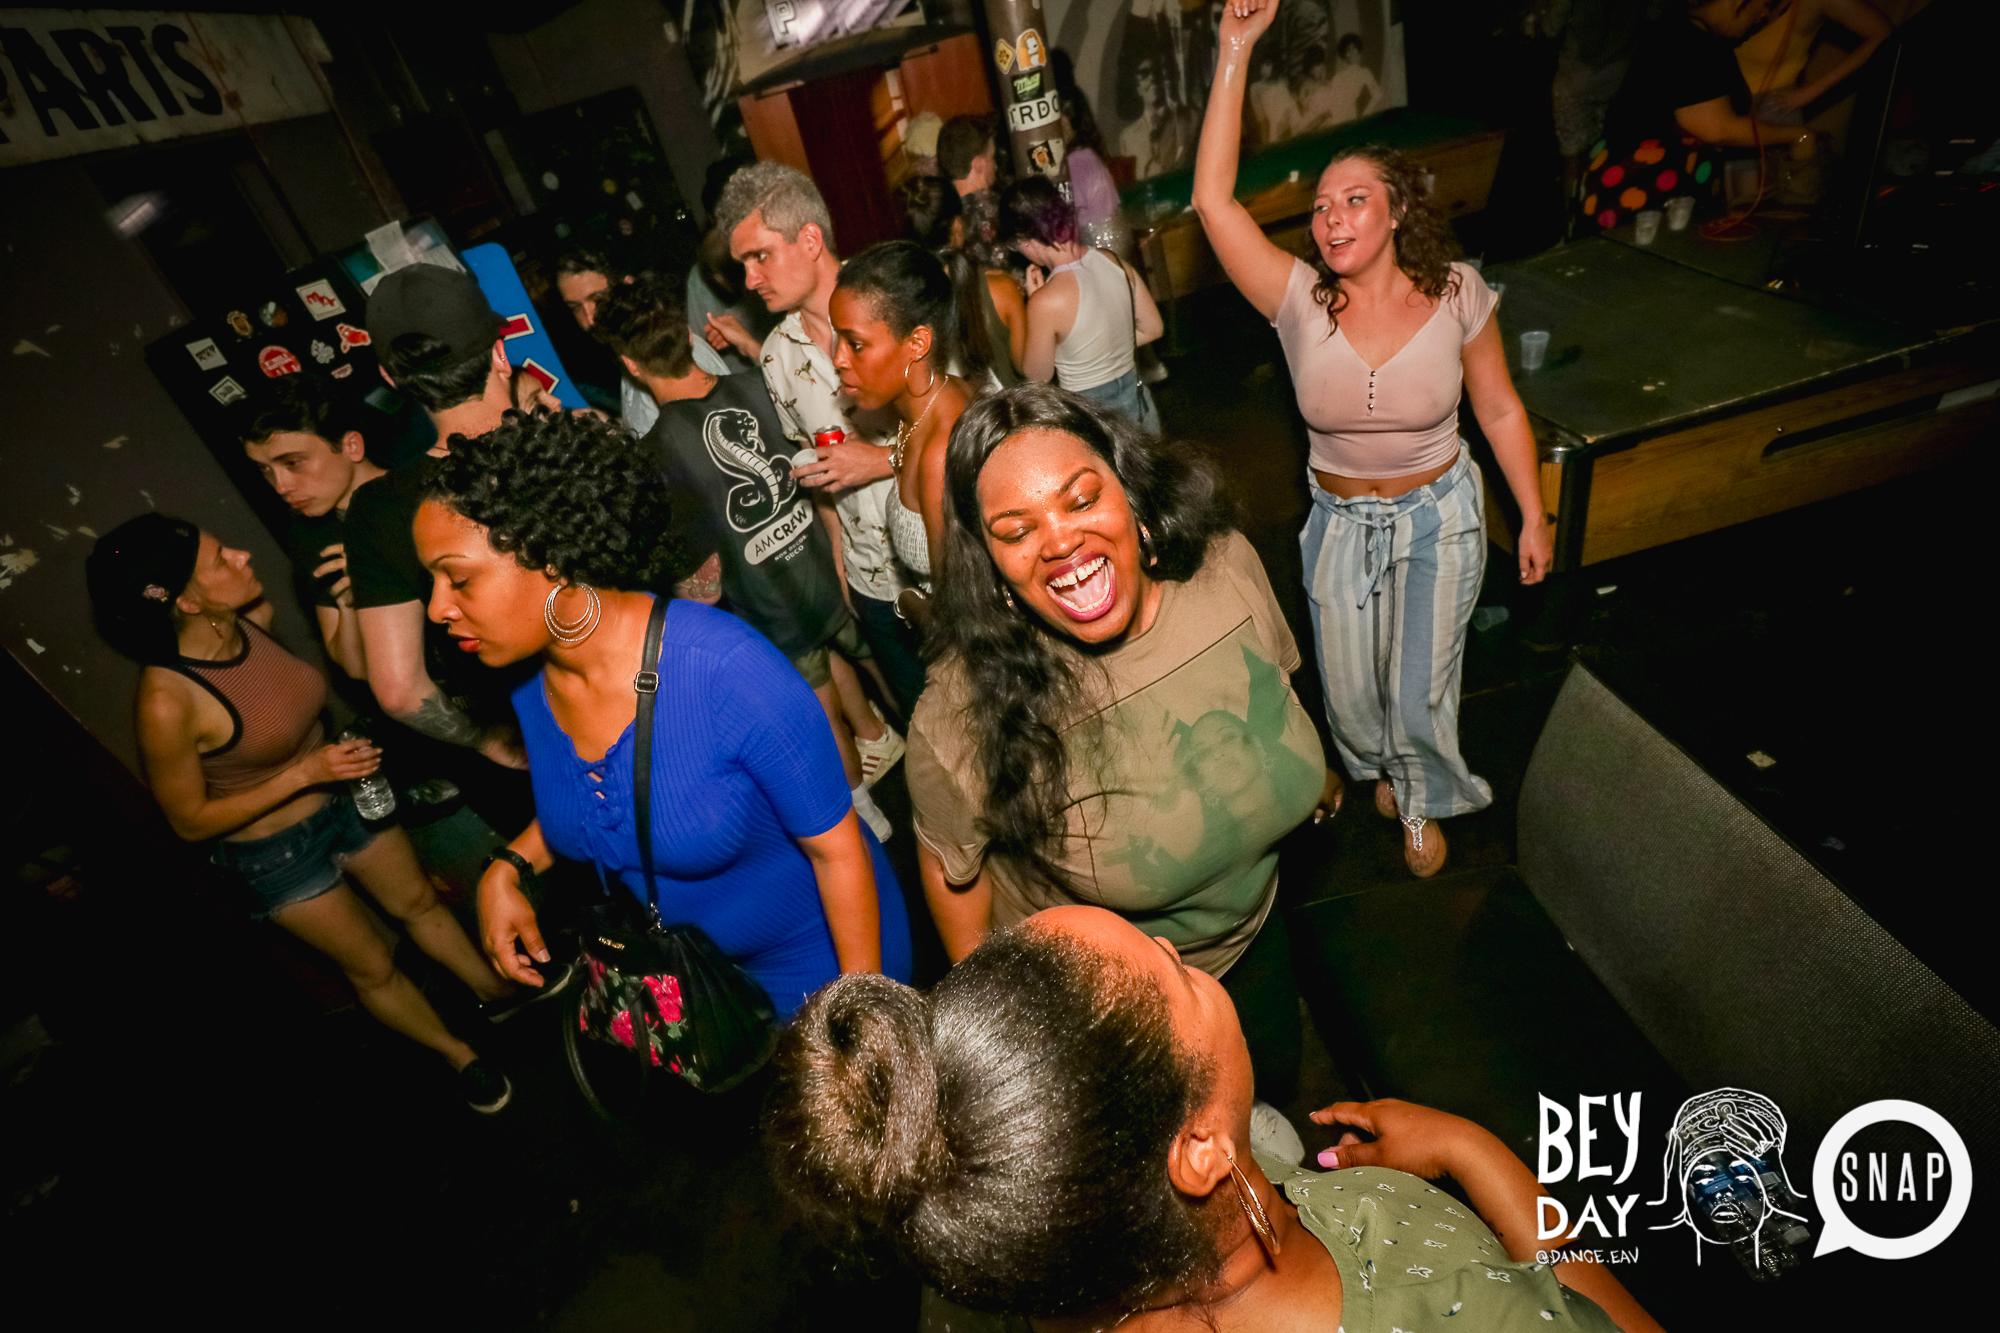 166Bey Day Grace Kelly The Basement Atlanta Oh Snap Kid.jpg